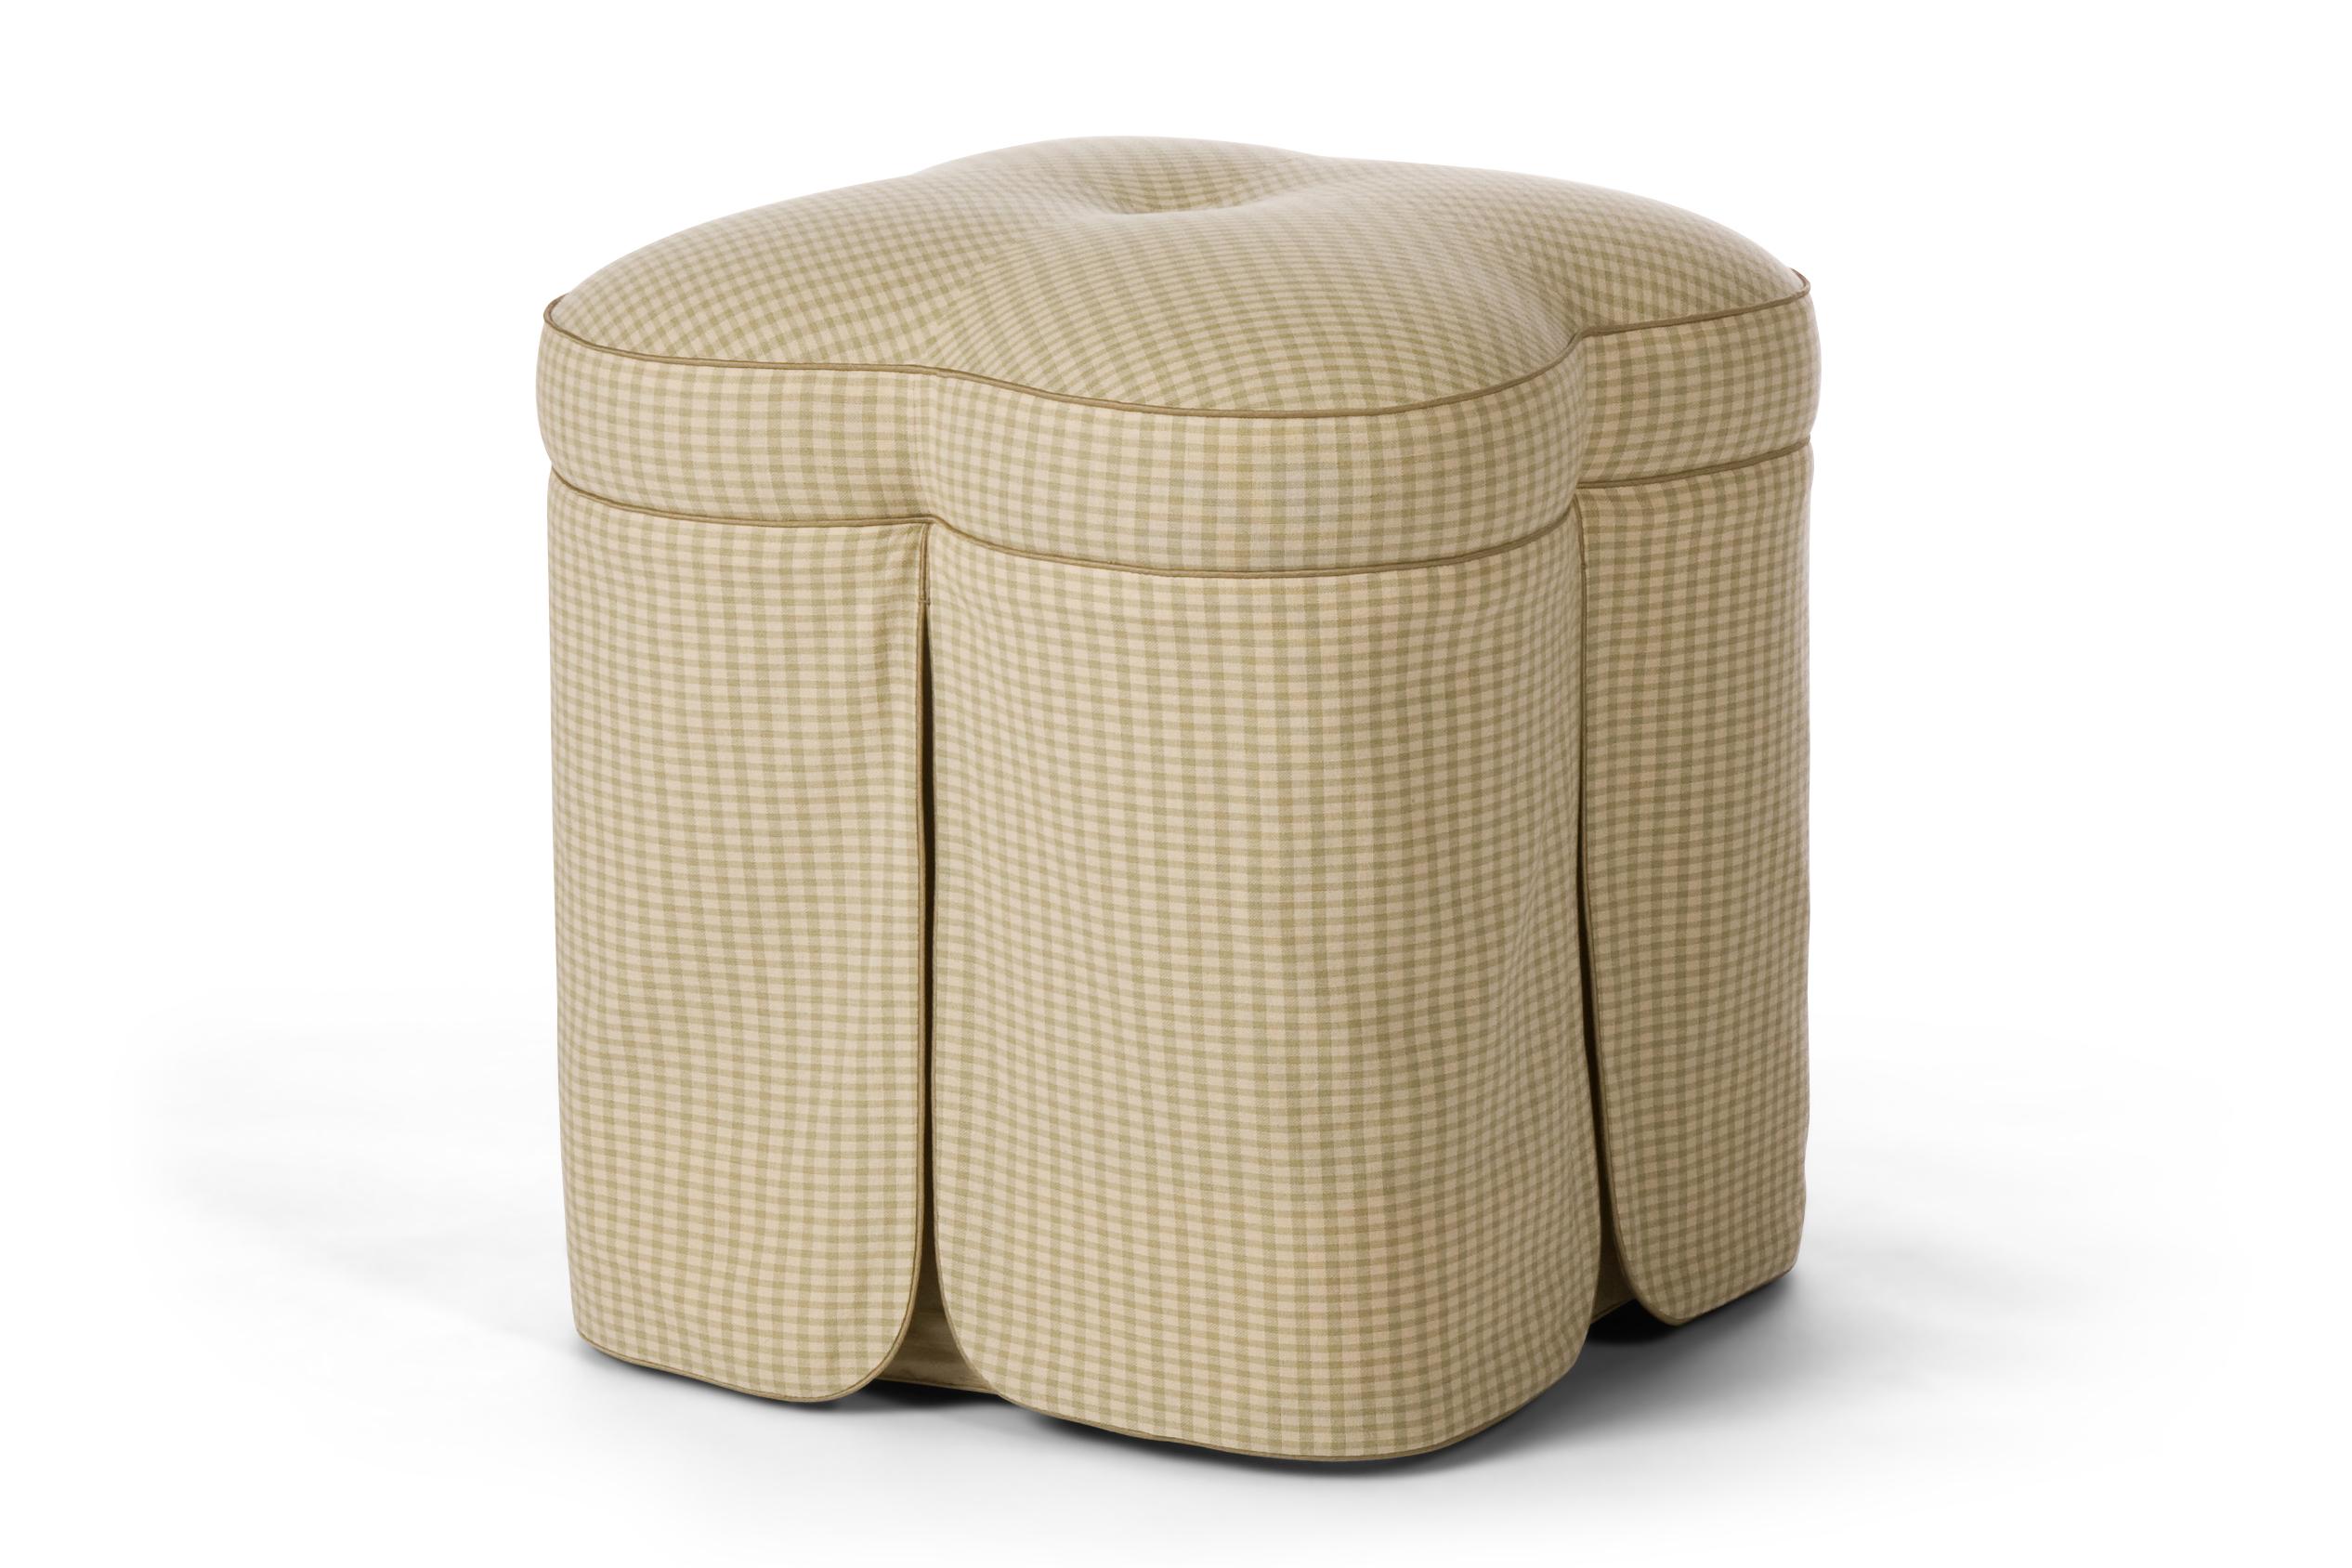 chair ideas gallery for stool bedroom stools bathroom globorank white chairs black vanity decoration design best home